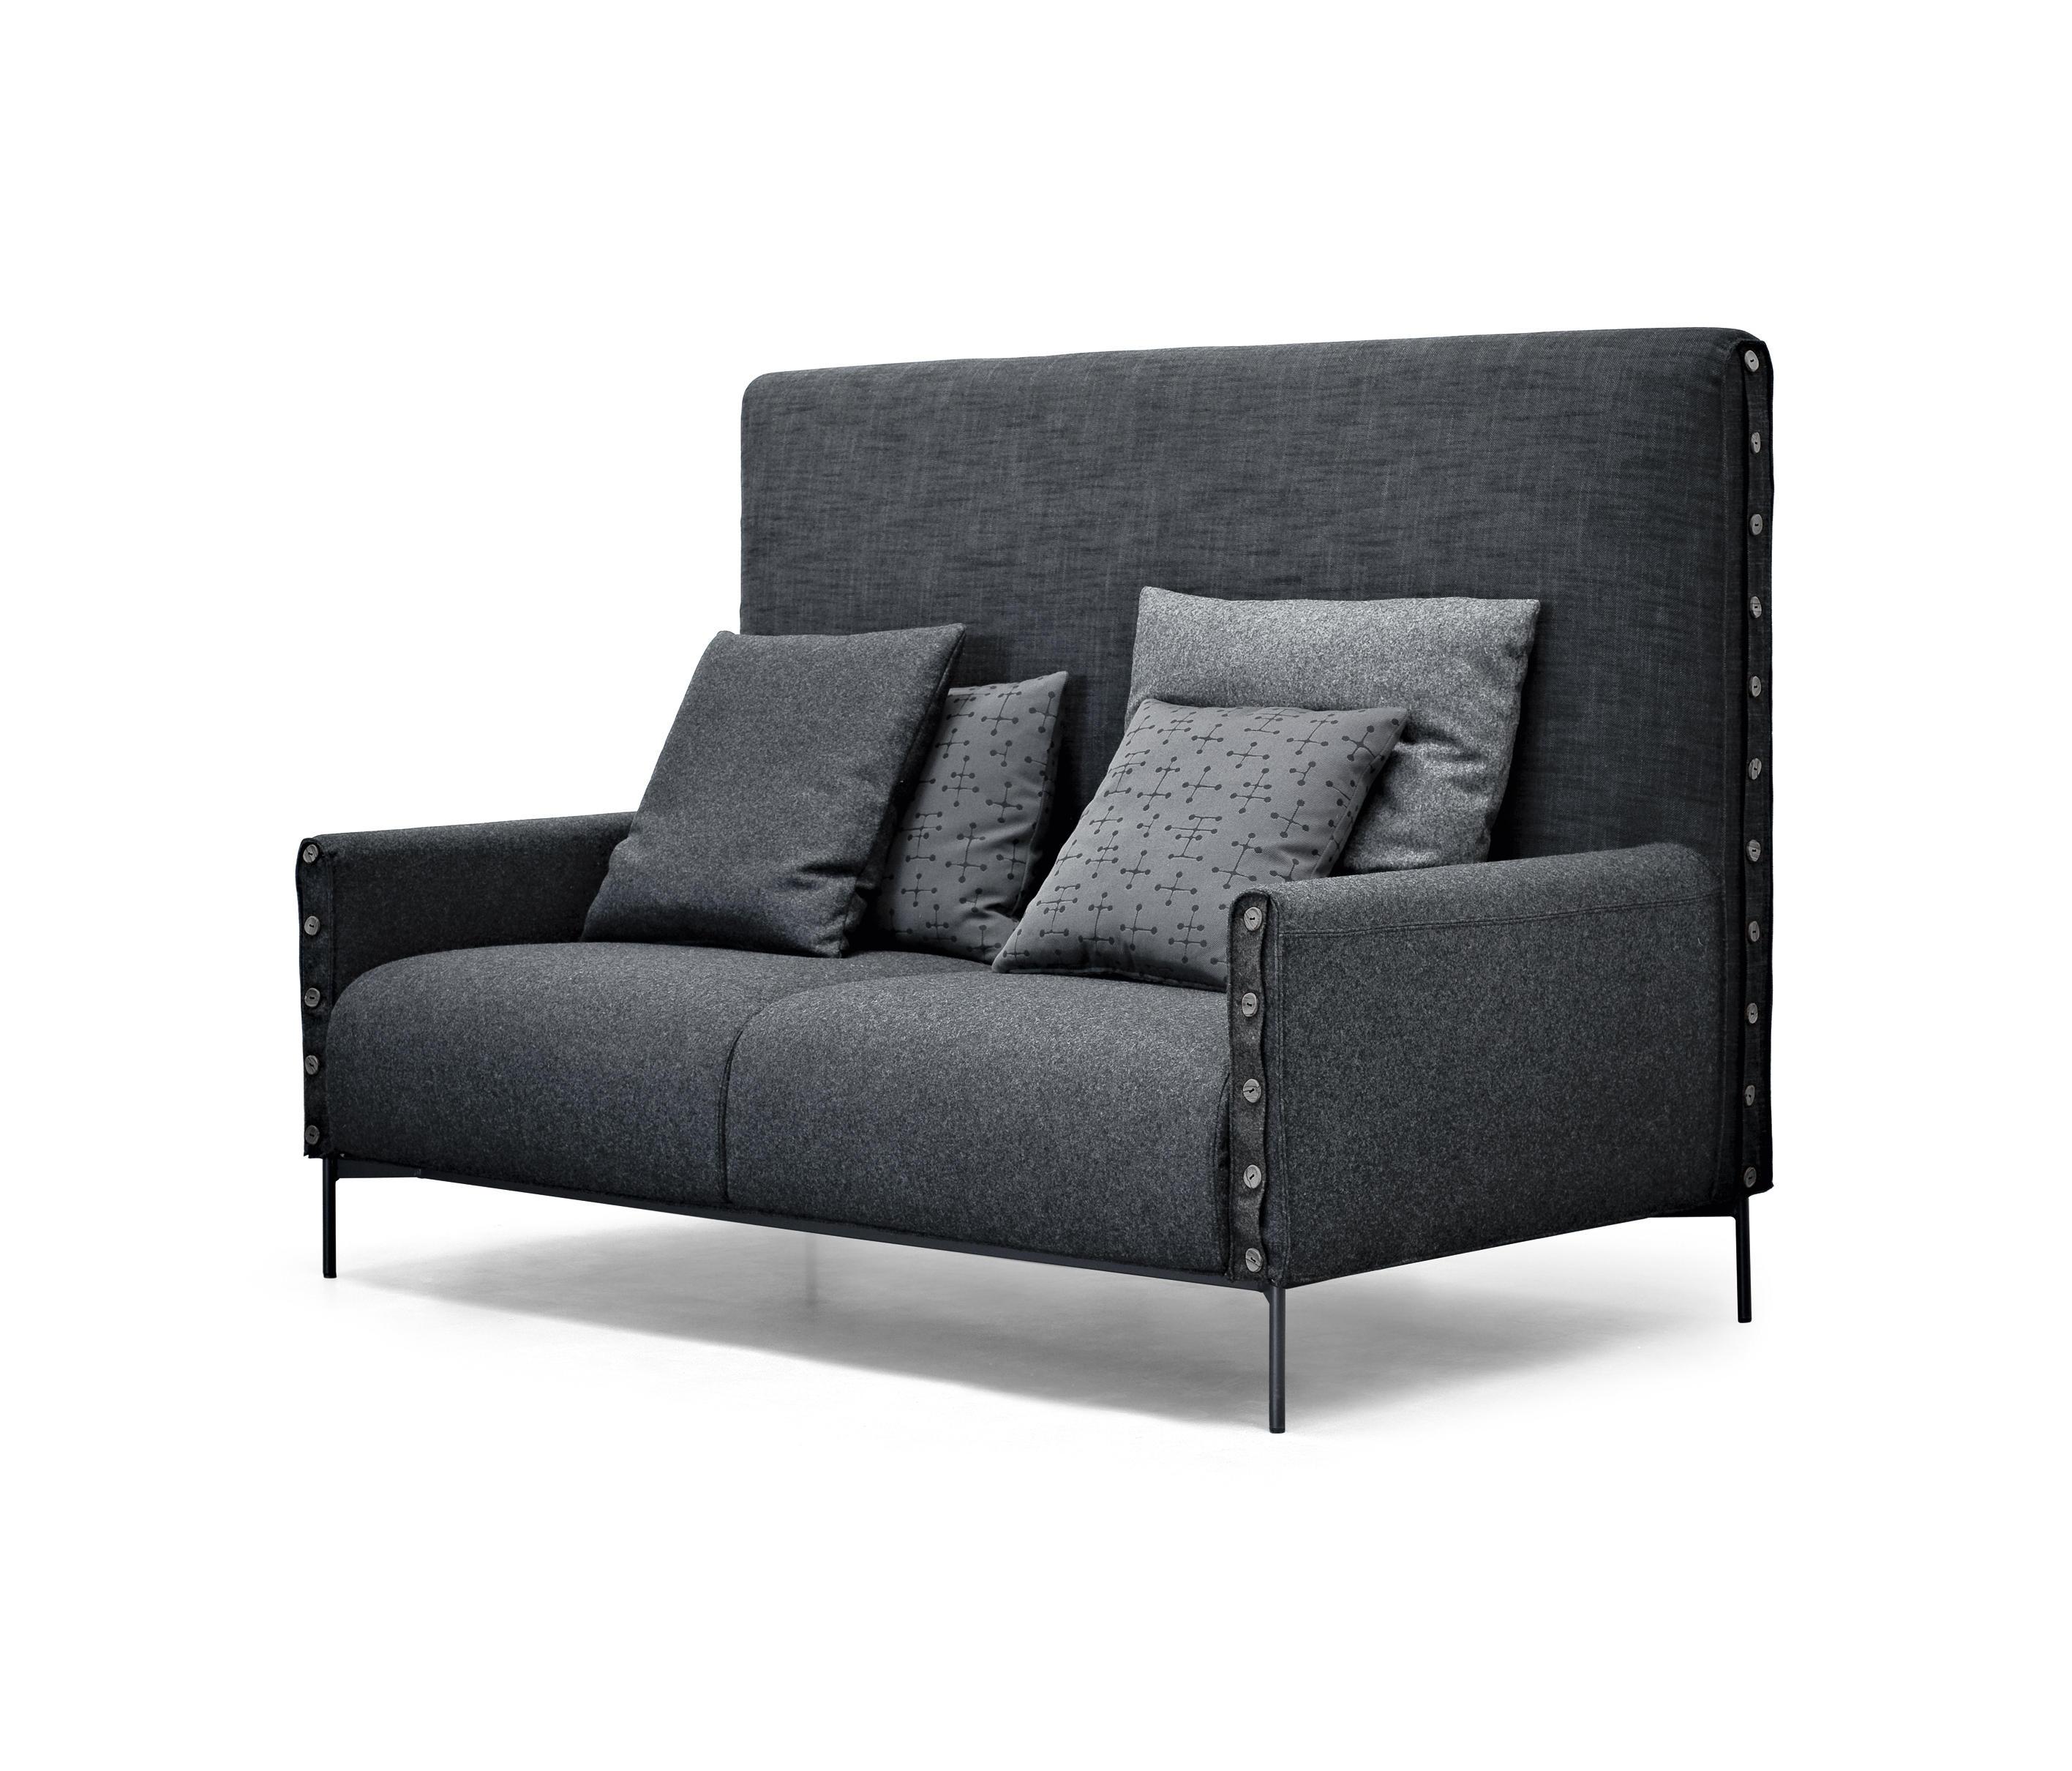 HIGHLIFE Lounge sofas from Tacchini Italia Architonic